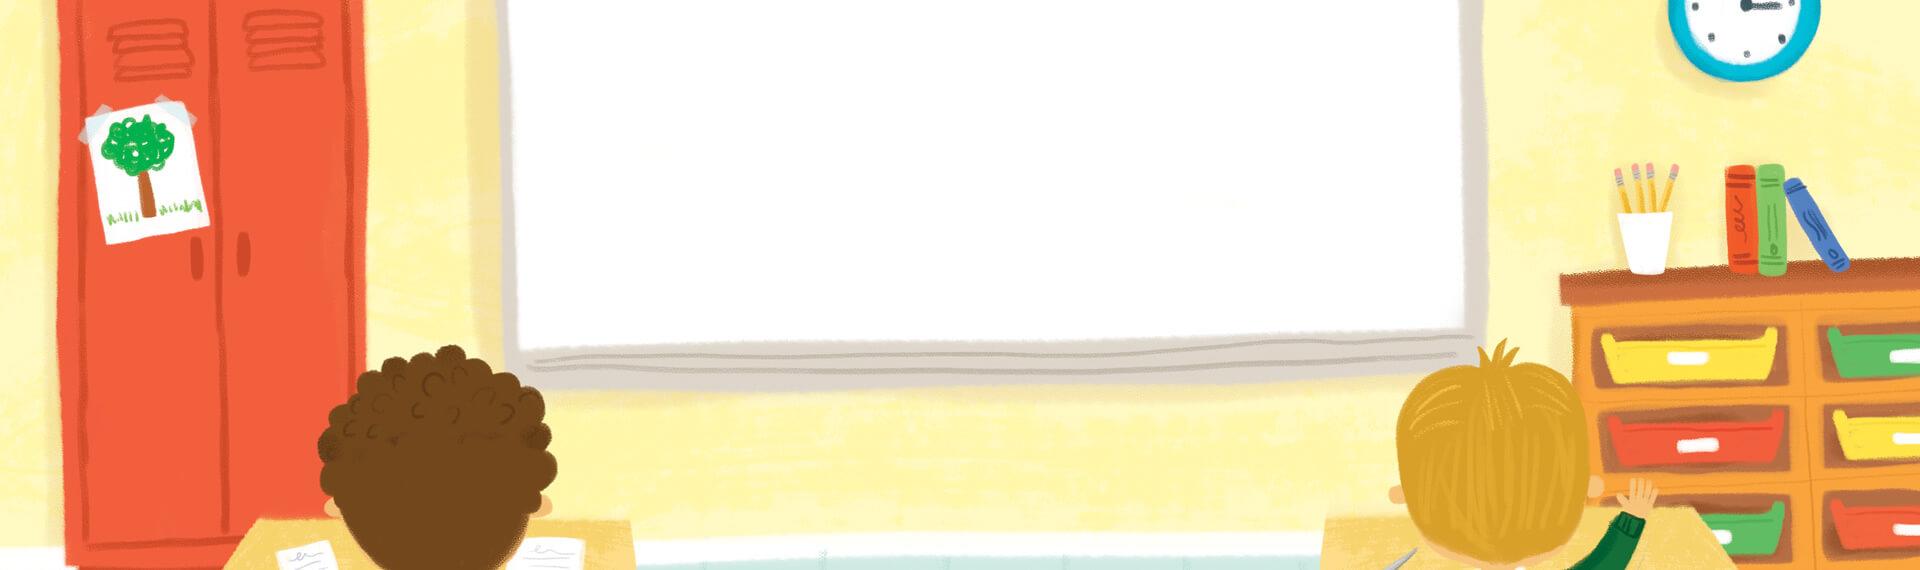 Illustration: Classroom